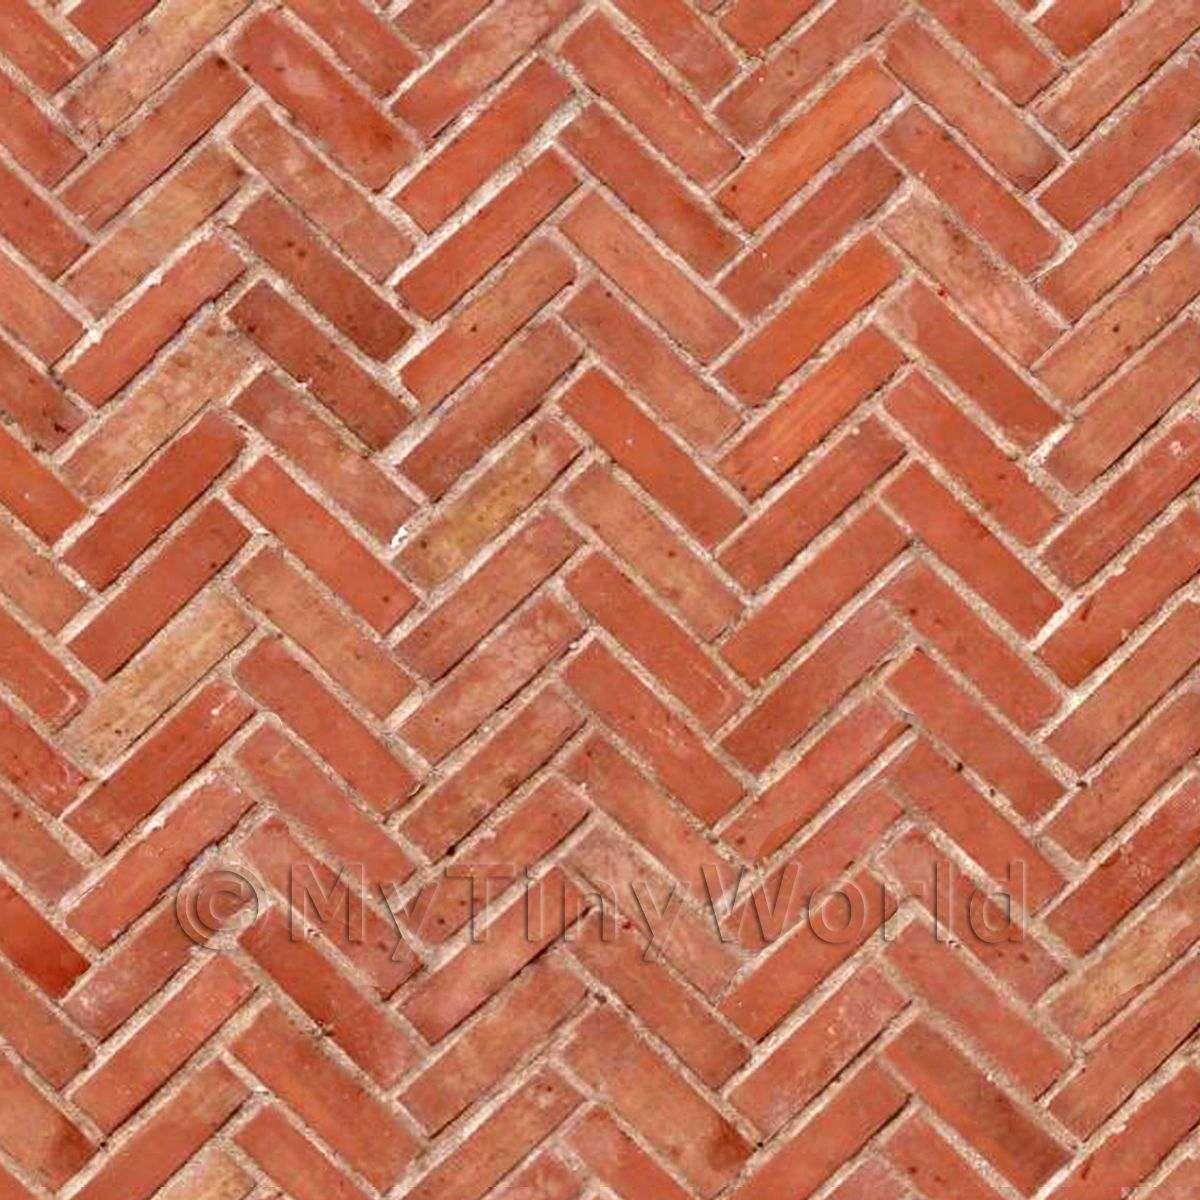 MyTinyWorld Dolls House Miniature Old Herringbone Brick Pattern Cladding. red paving bricks uk   Google Search   garden   Pinterest   Bricks